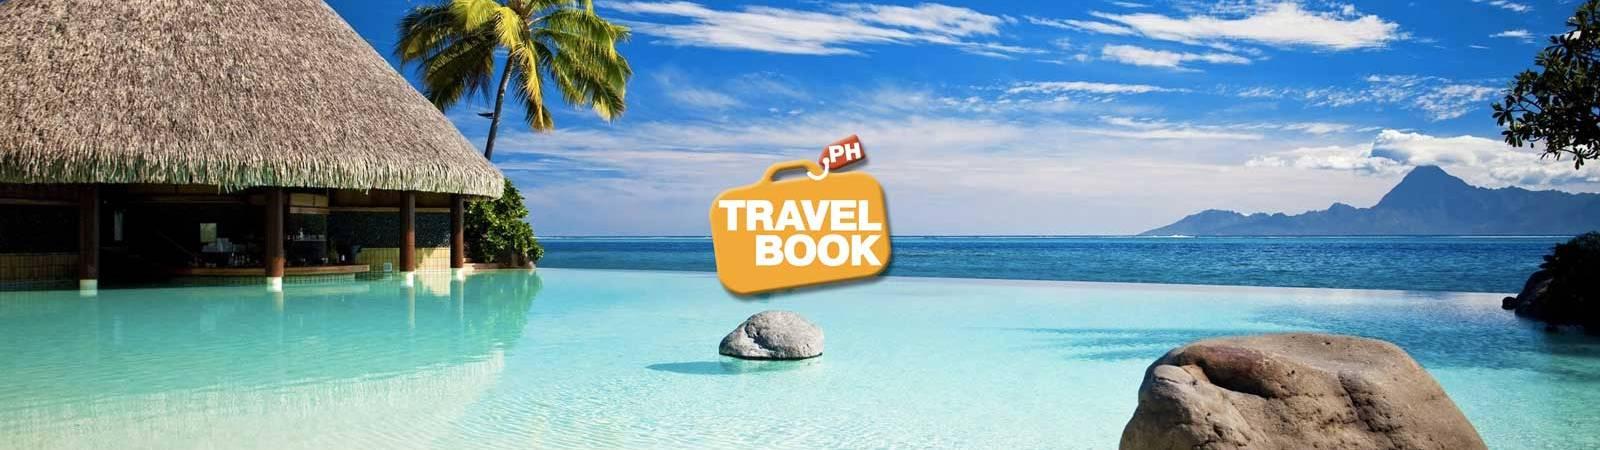 travelbook.ph